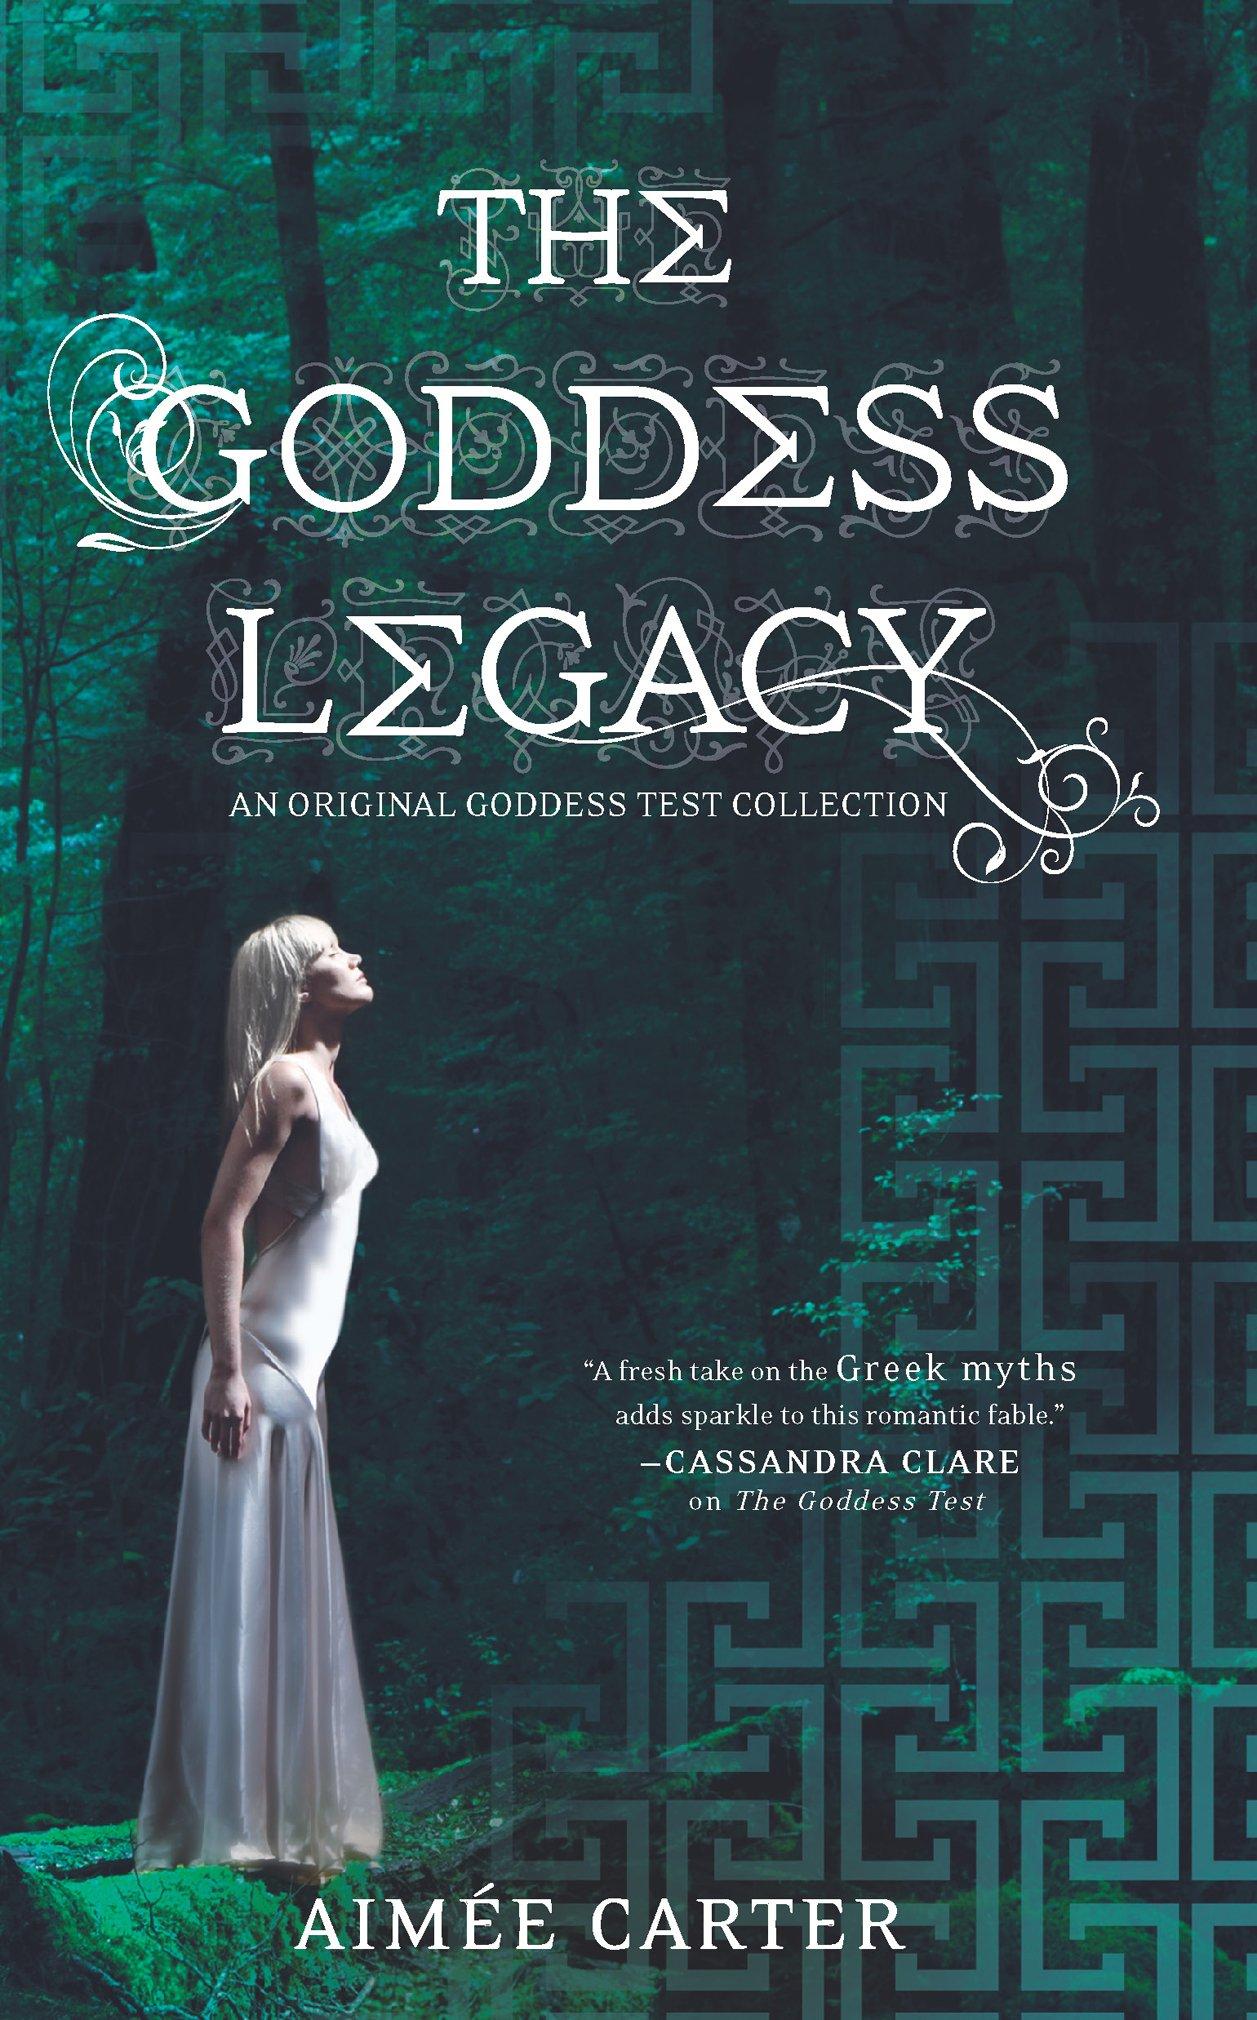 Read Online The Goddess Legacy (The Goddess Queen / The Lovestruck Goddess / Goddess of the Underworld / God of Thieves / God of Darkness (Goddess Test) pdf